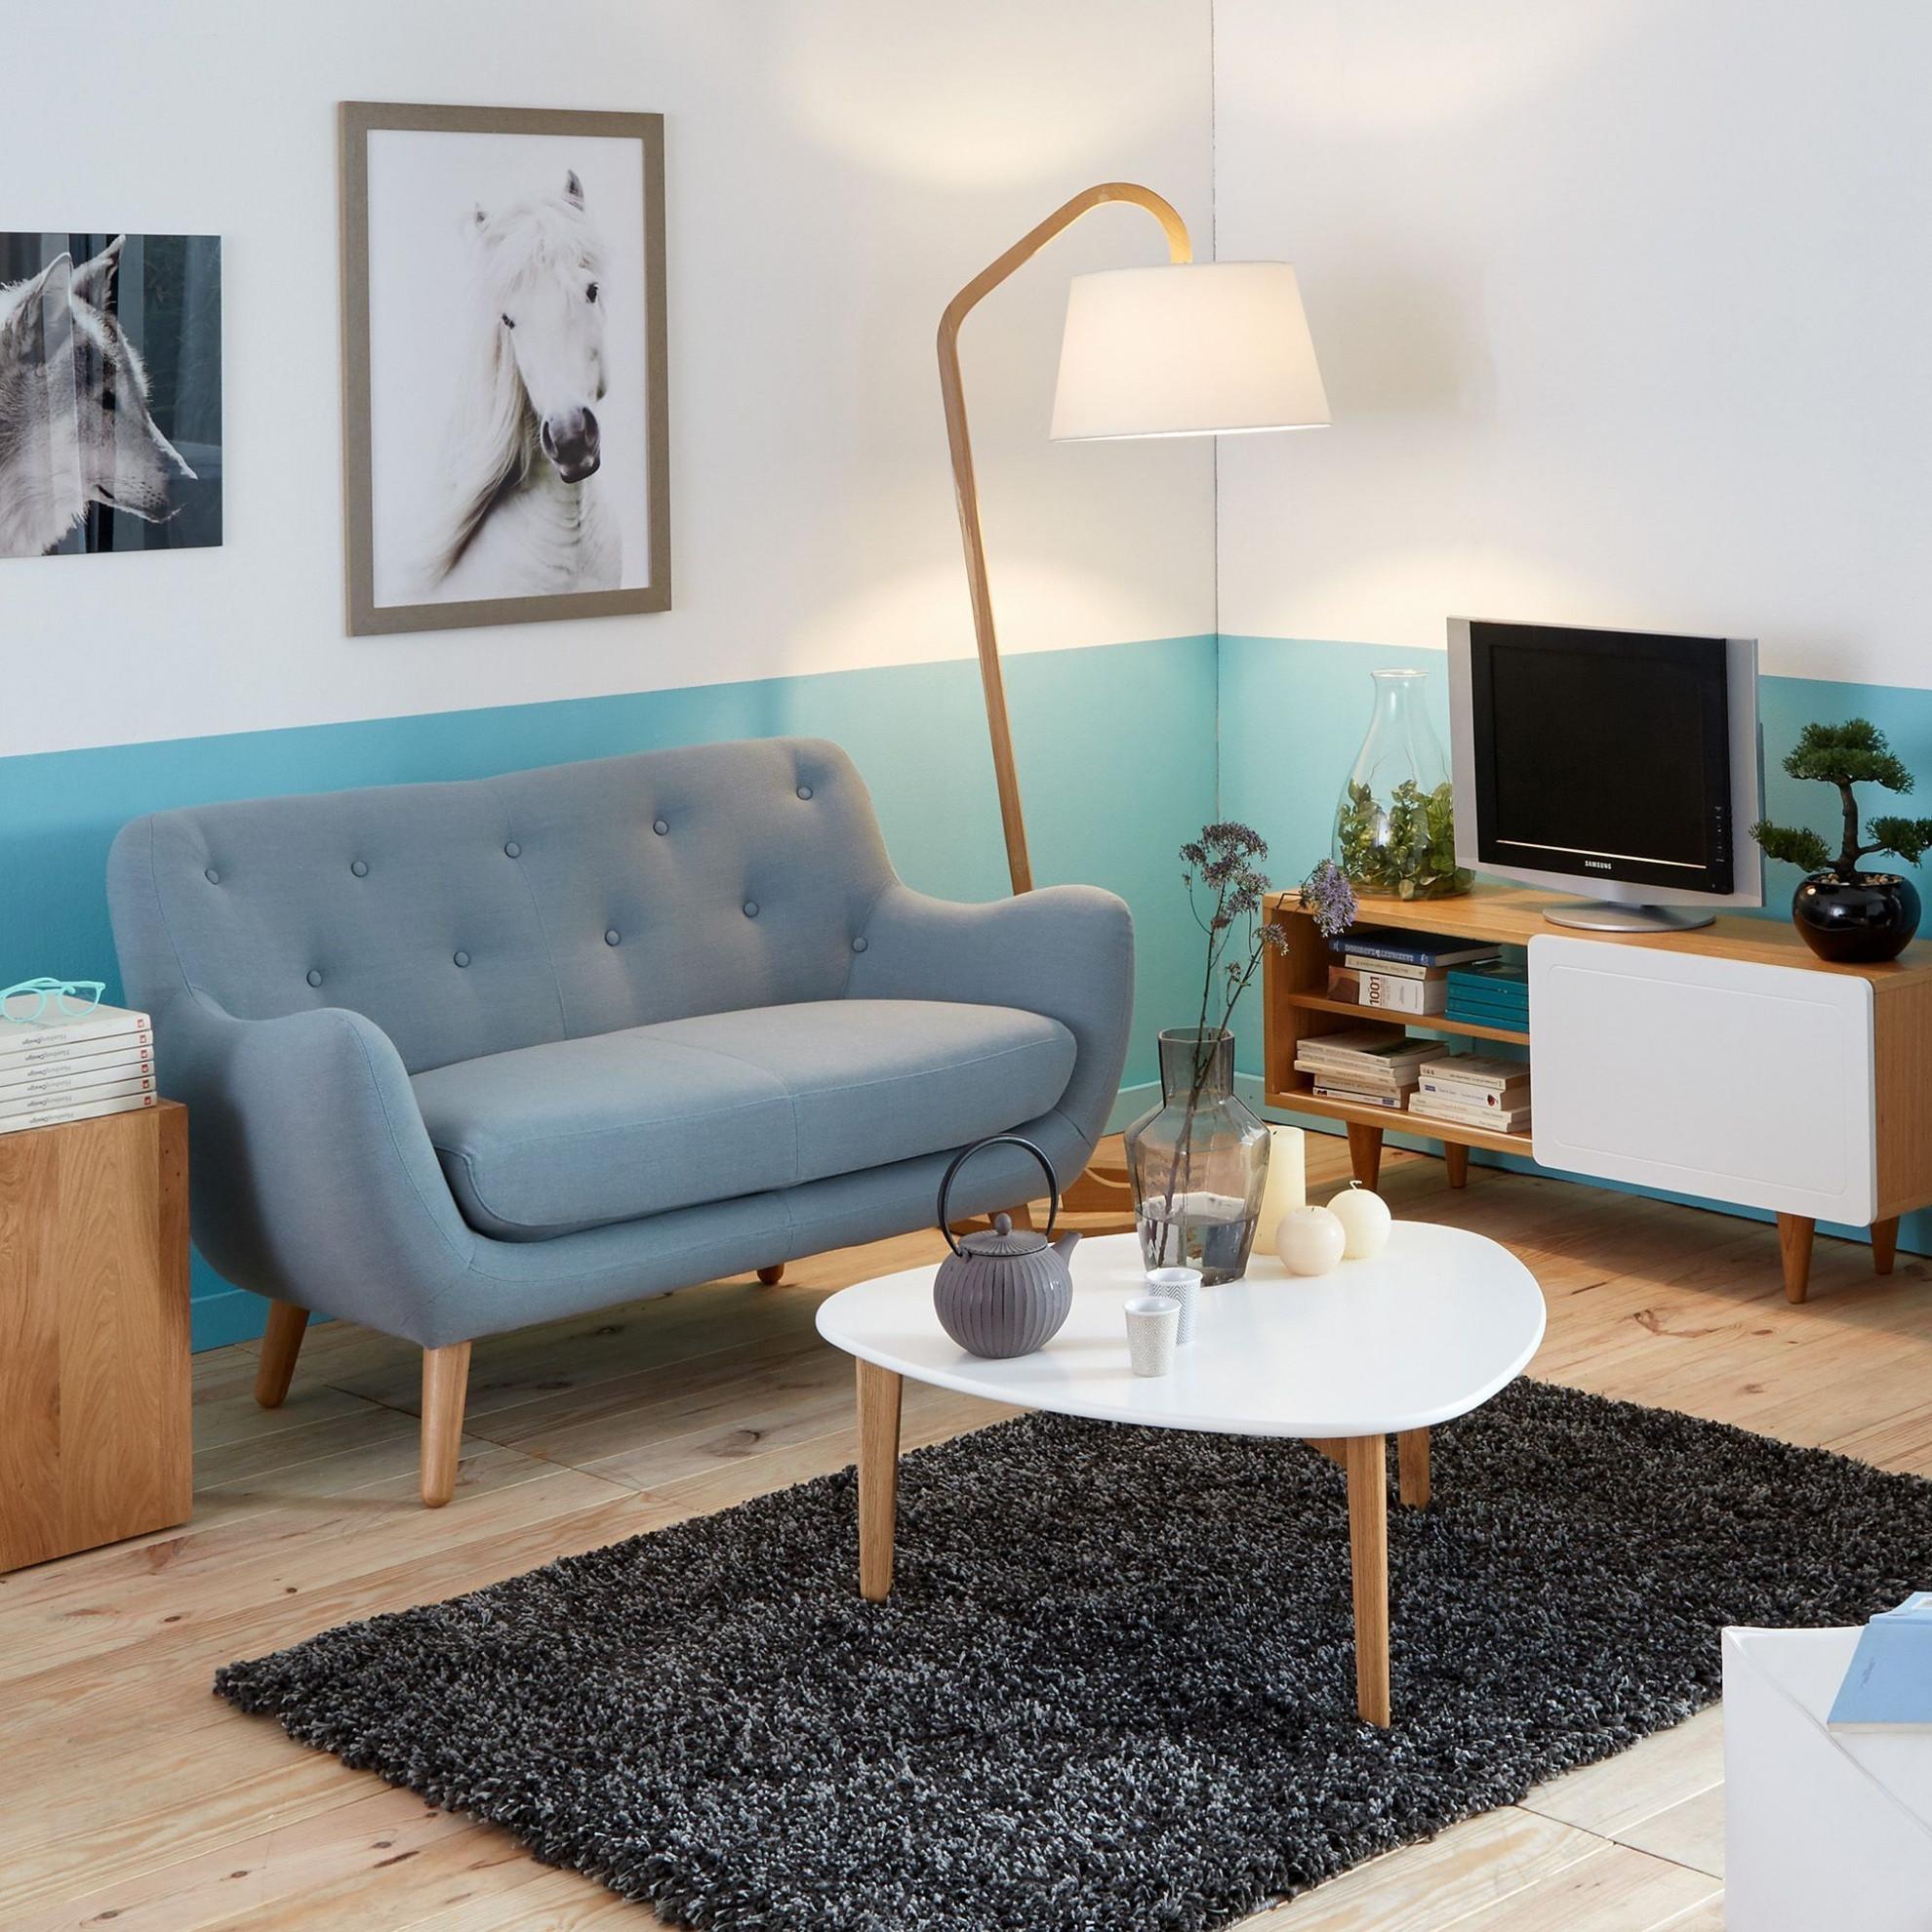 salon du meuble meubles de salon meuble balcon meilleur harley salon 0d collection of salon du meuble